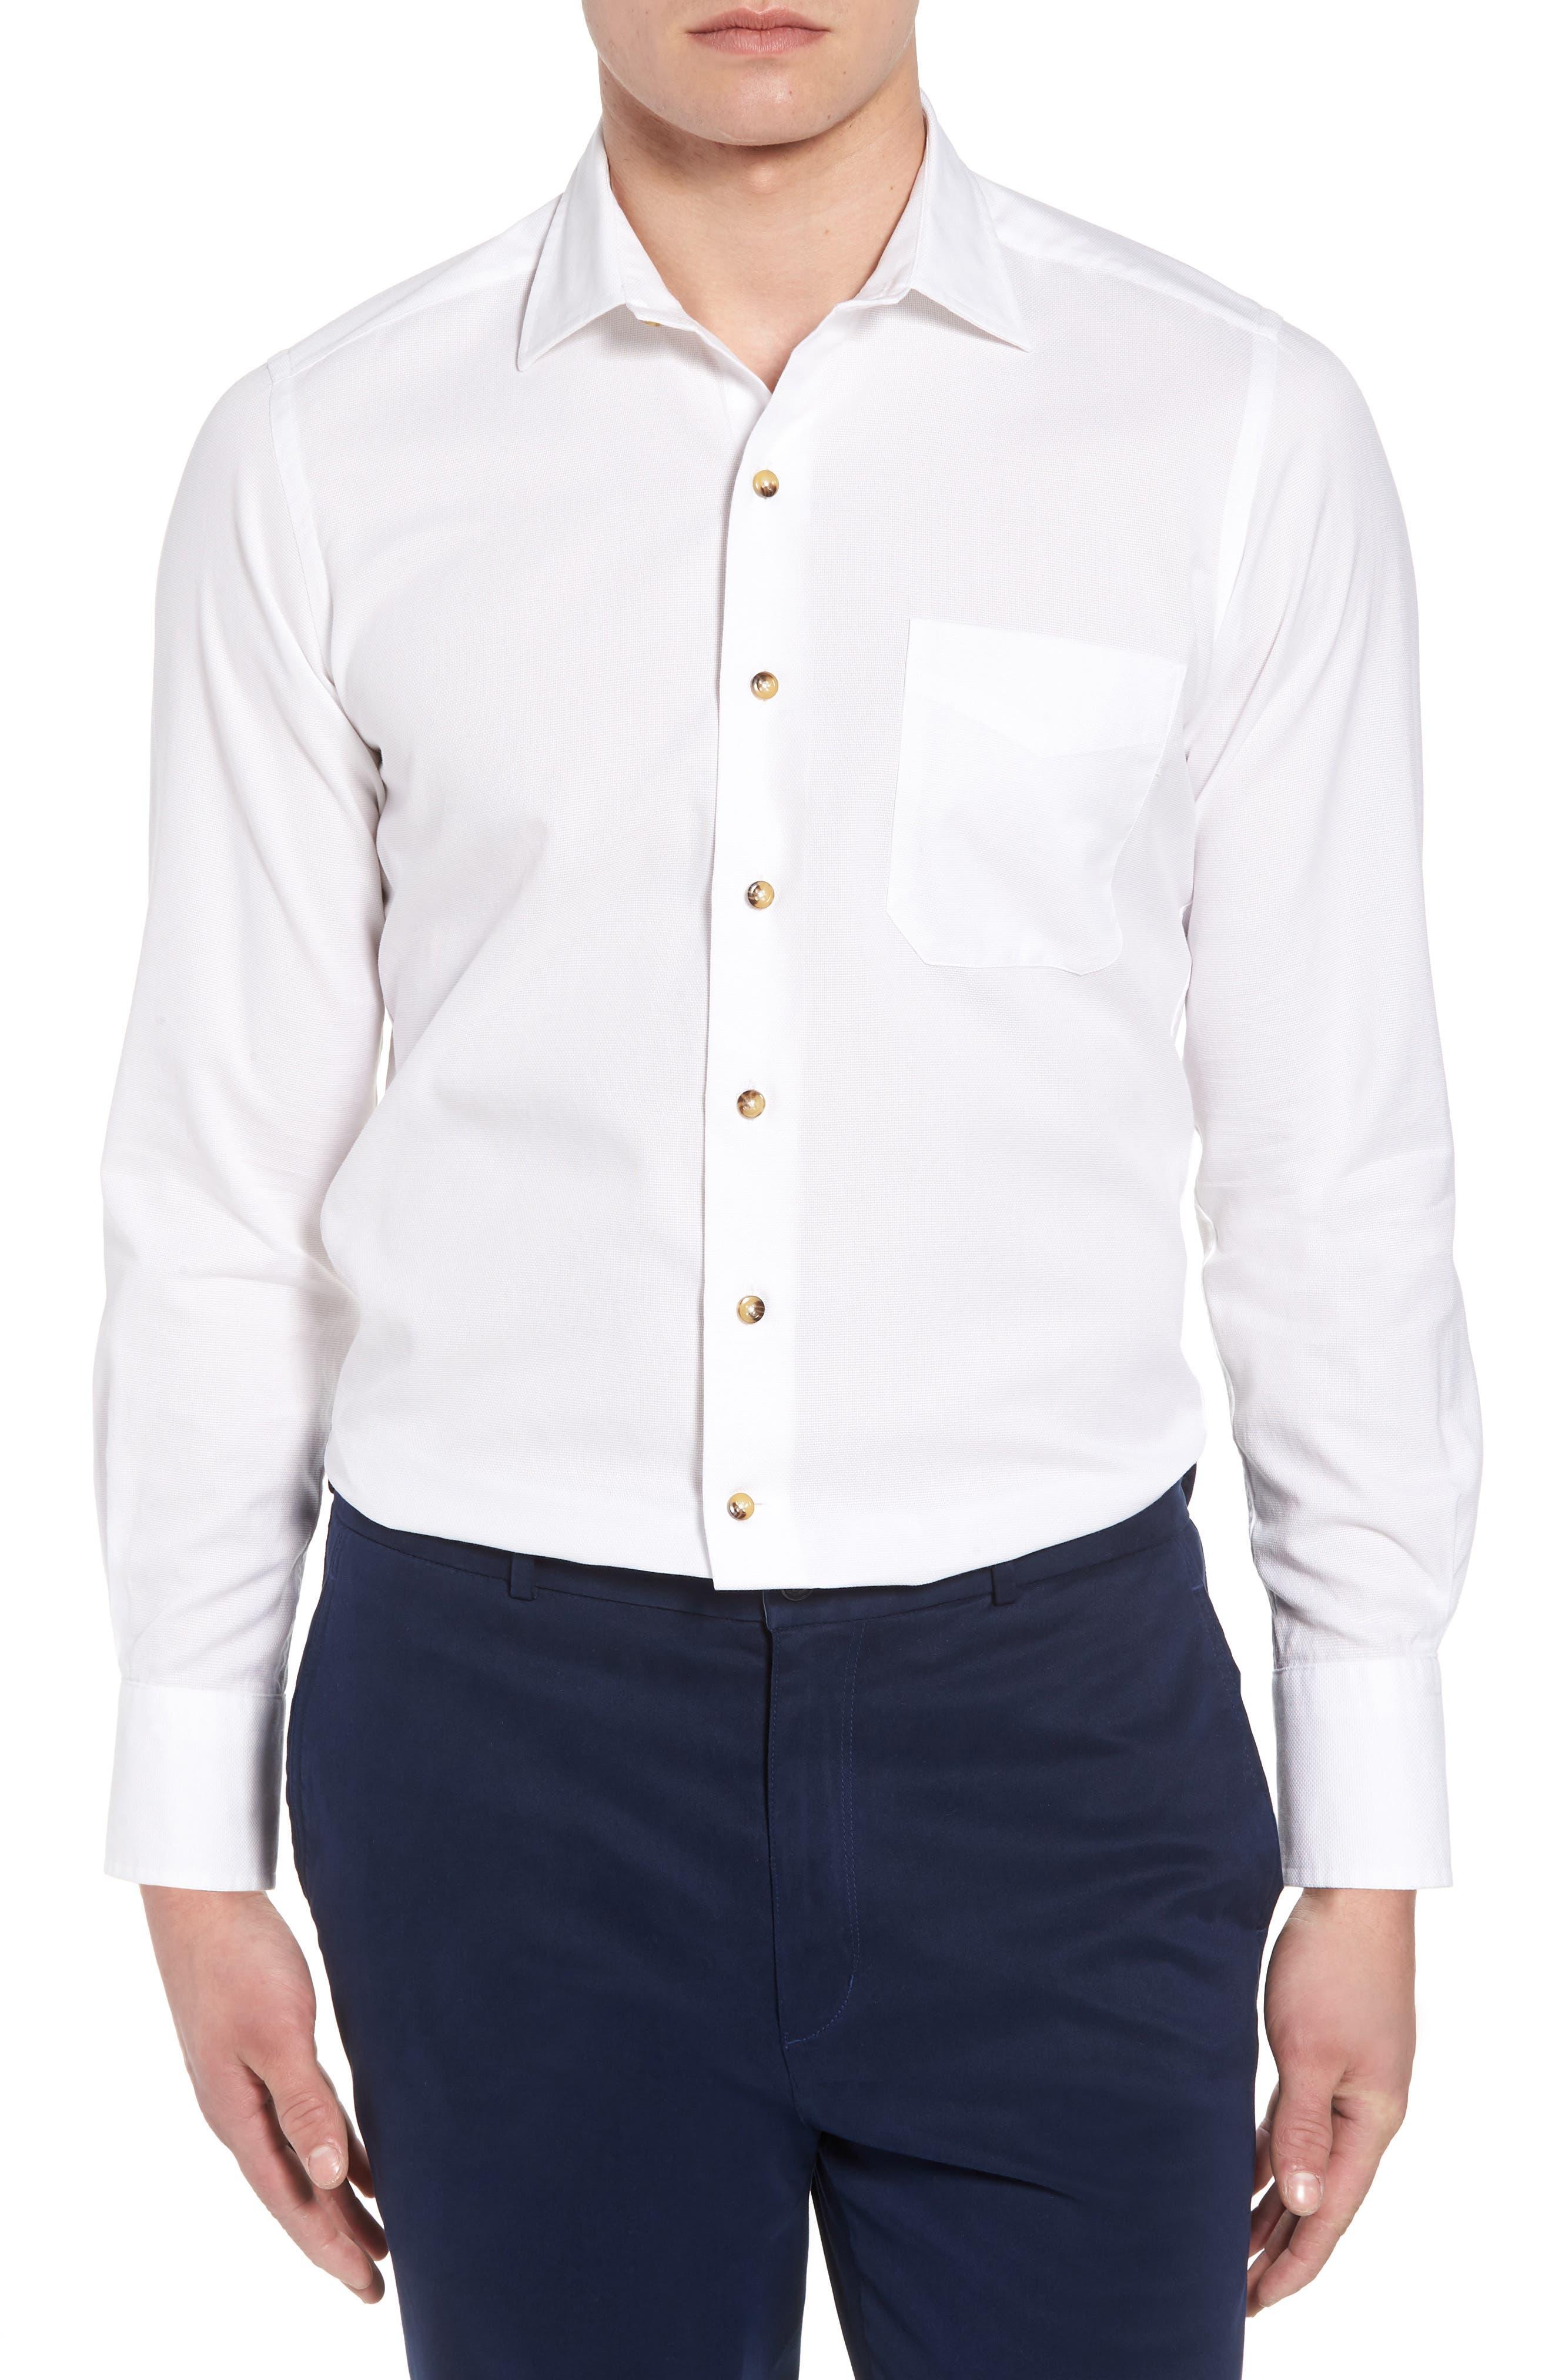 Regular Fit Garment Washed Sport Shirt,                             Main thumbnail 1, color,                             White